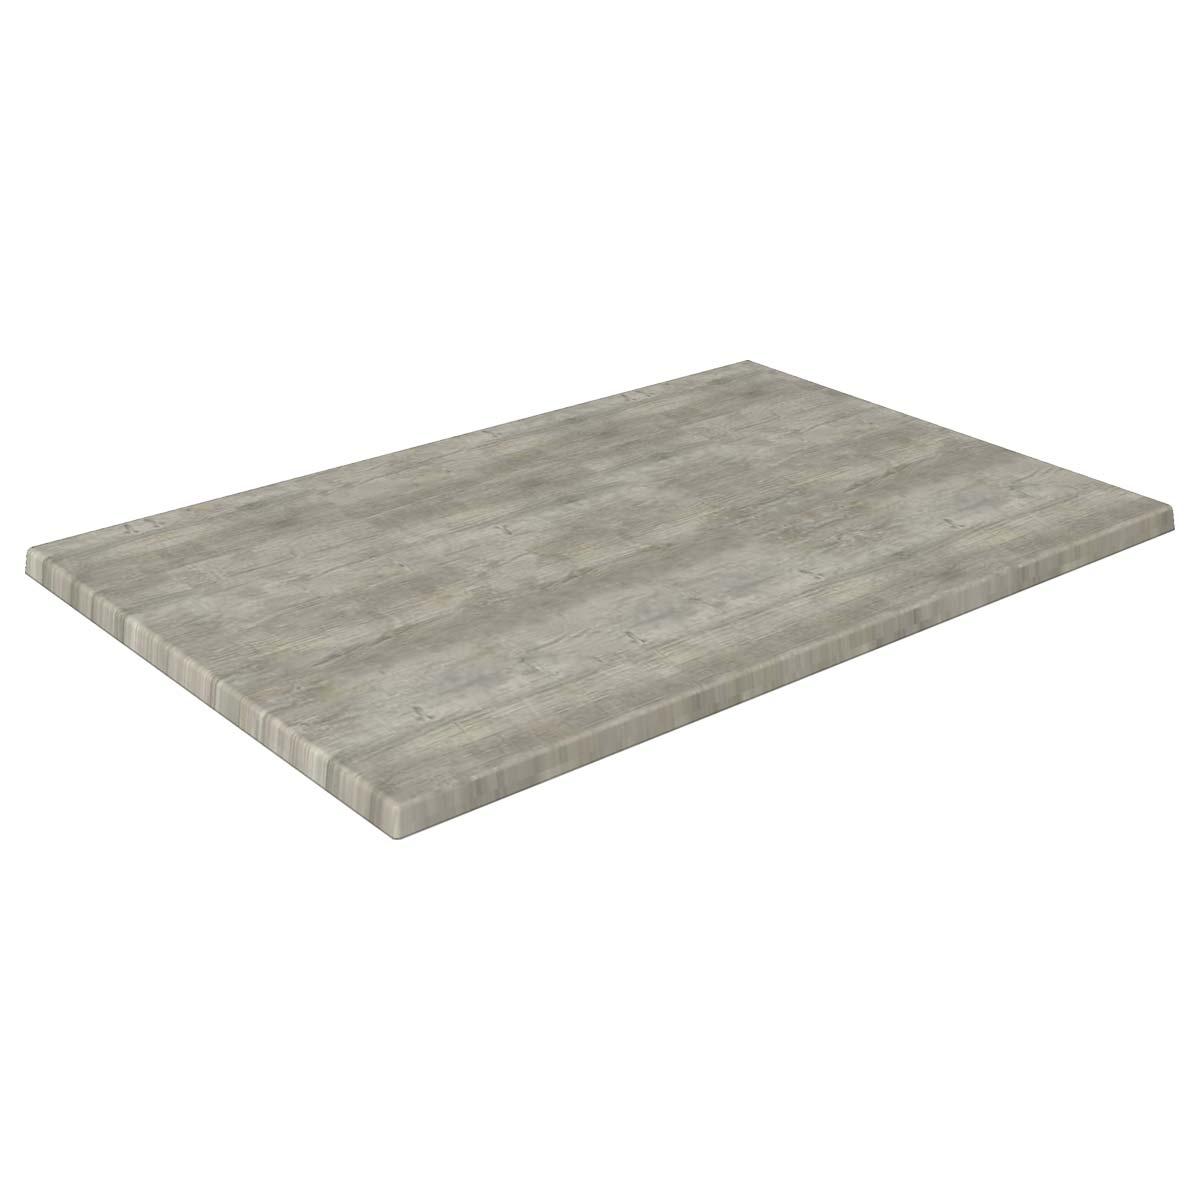 TICLA E120X80 178 - https://www.werzalit.com/fr/produit/plateau-de-table-classic-werzalit-e-110x70-178-ponderosa-weiss/